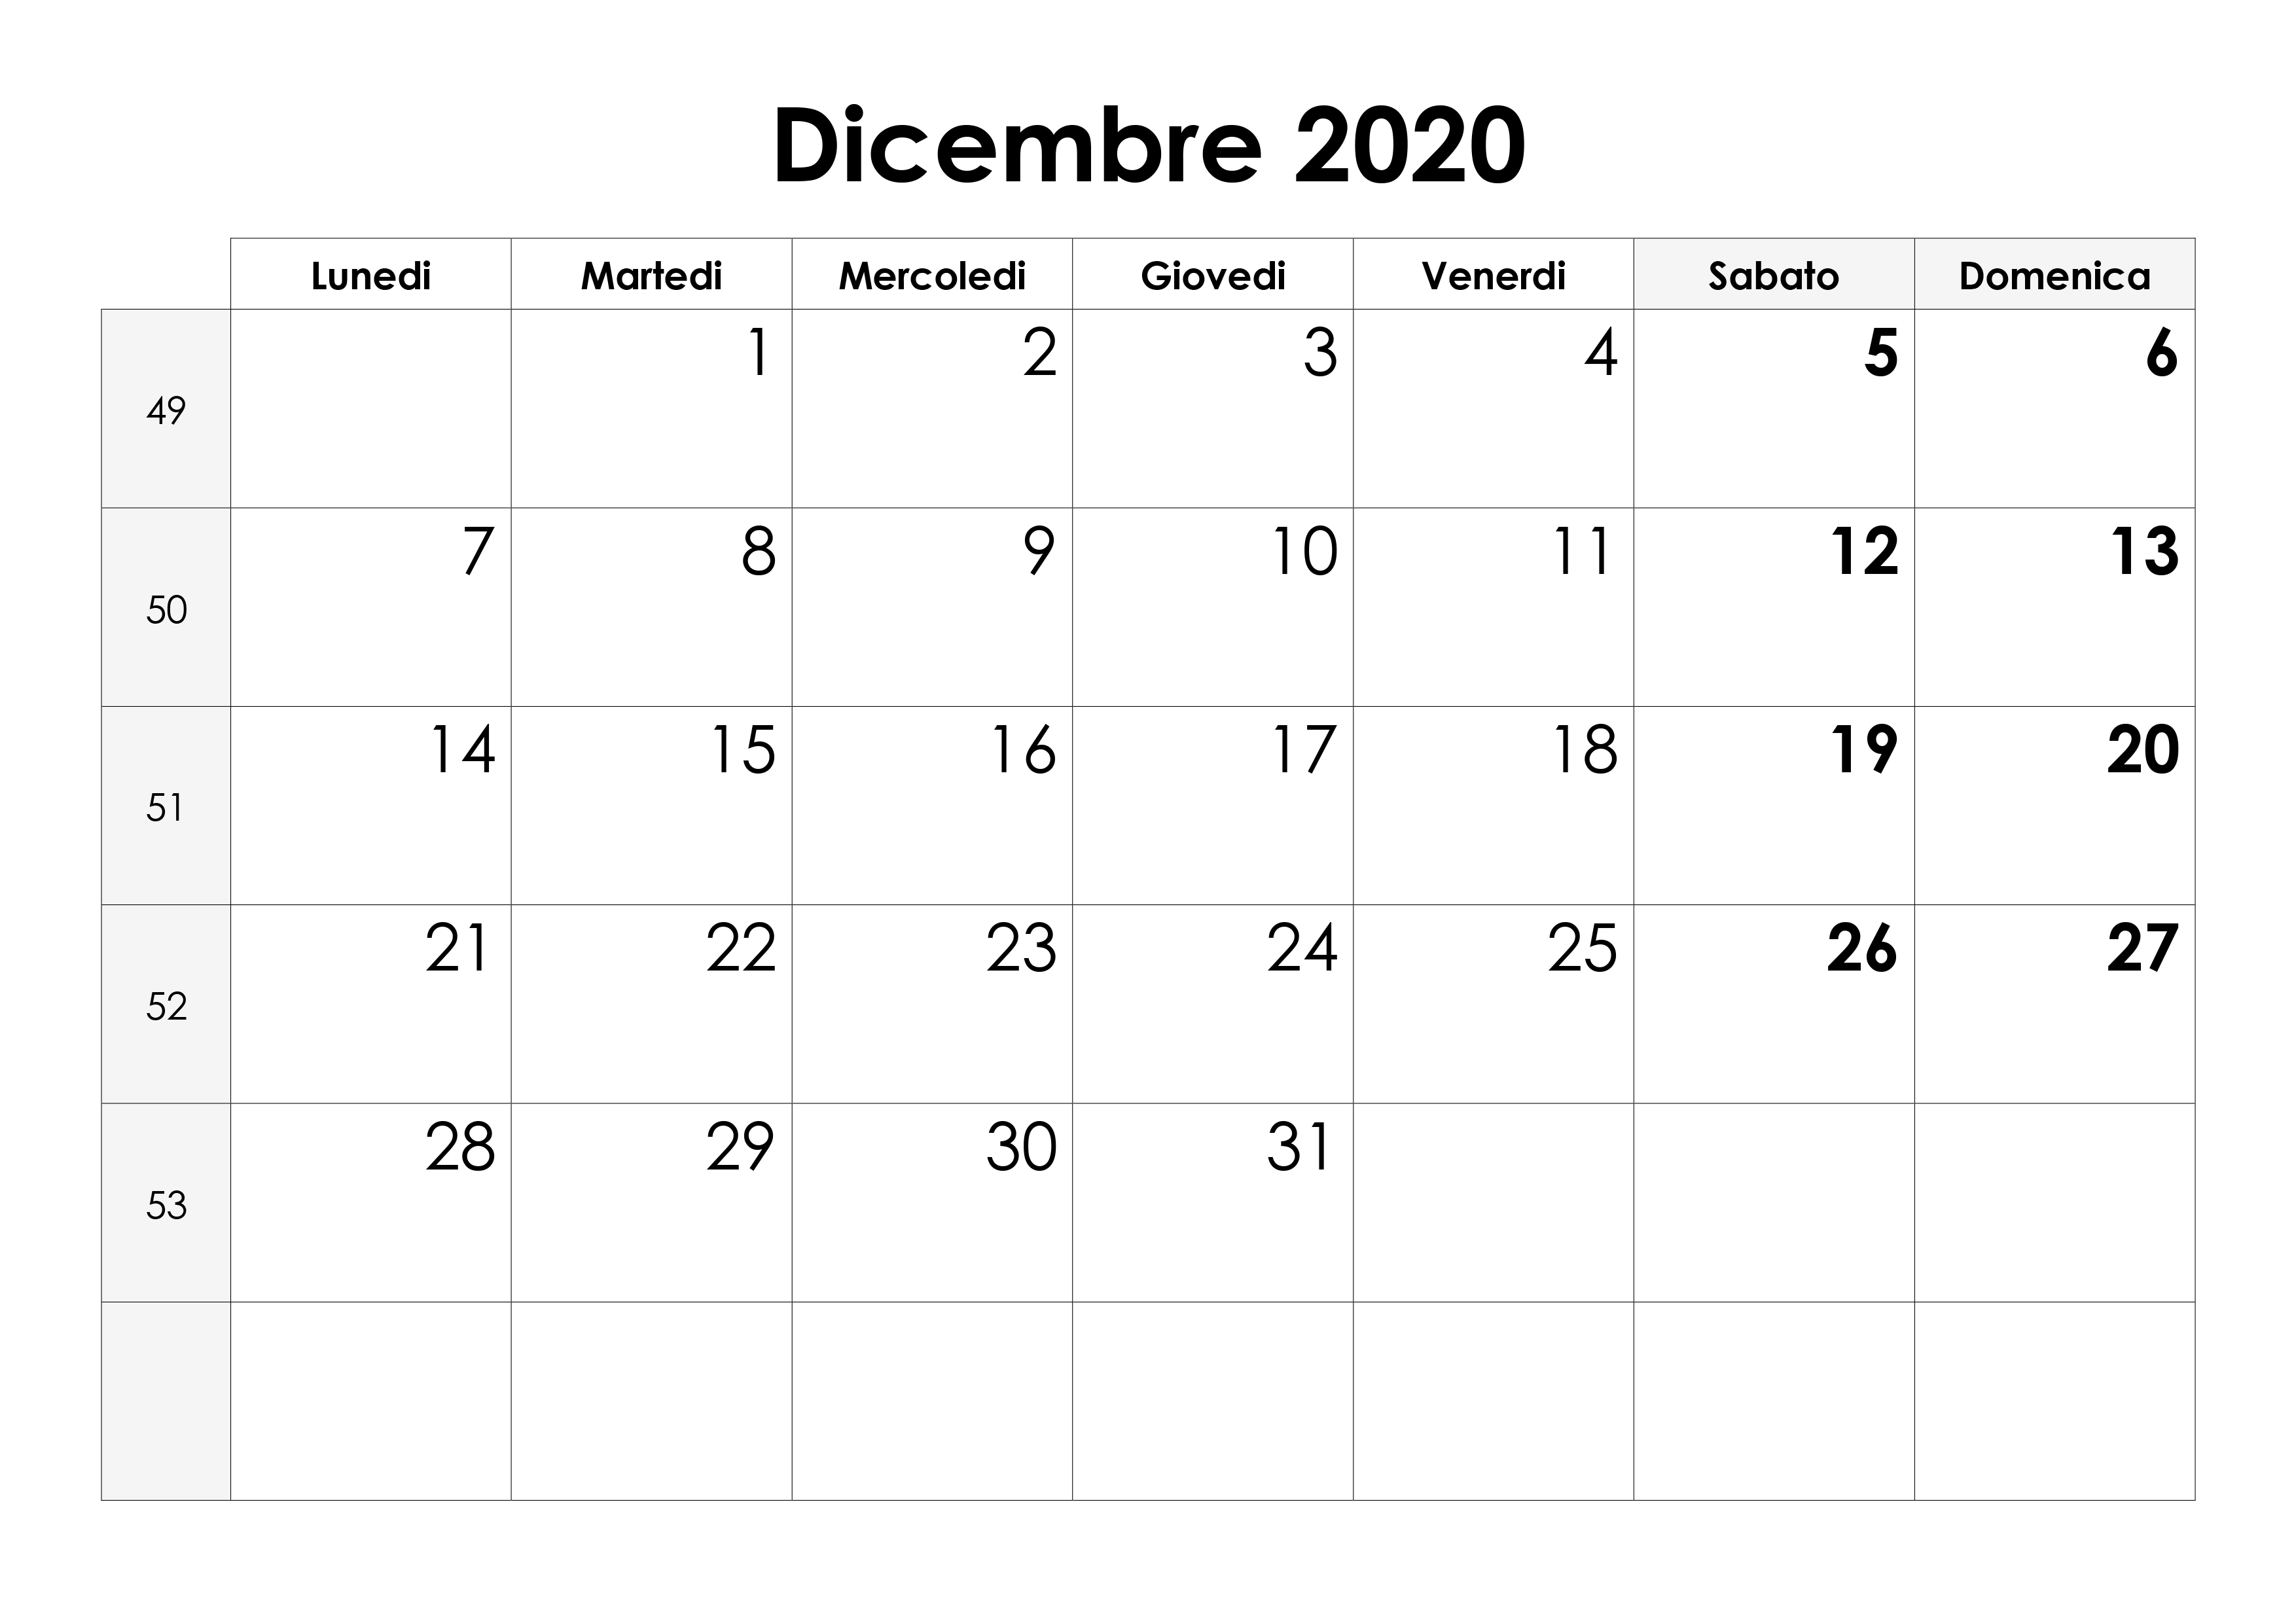 Dicembre Calendario 2020.Calendario Dicembre 2020 Calendario Su